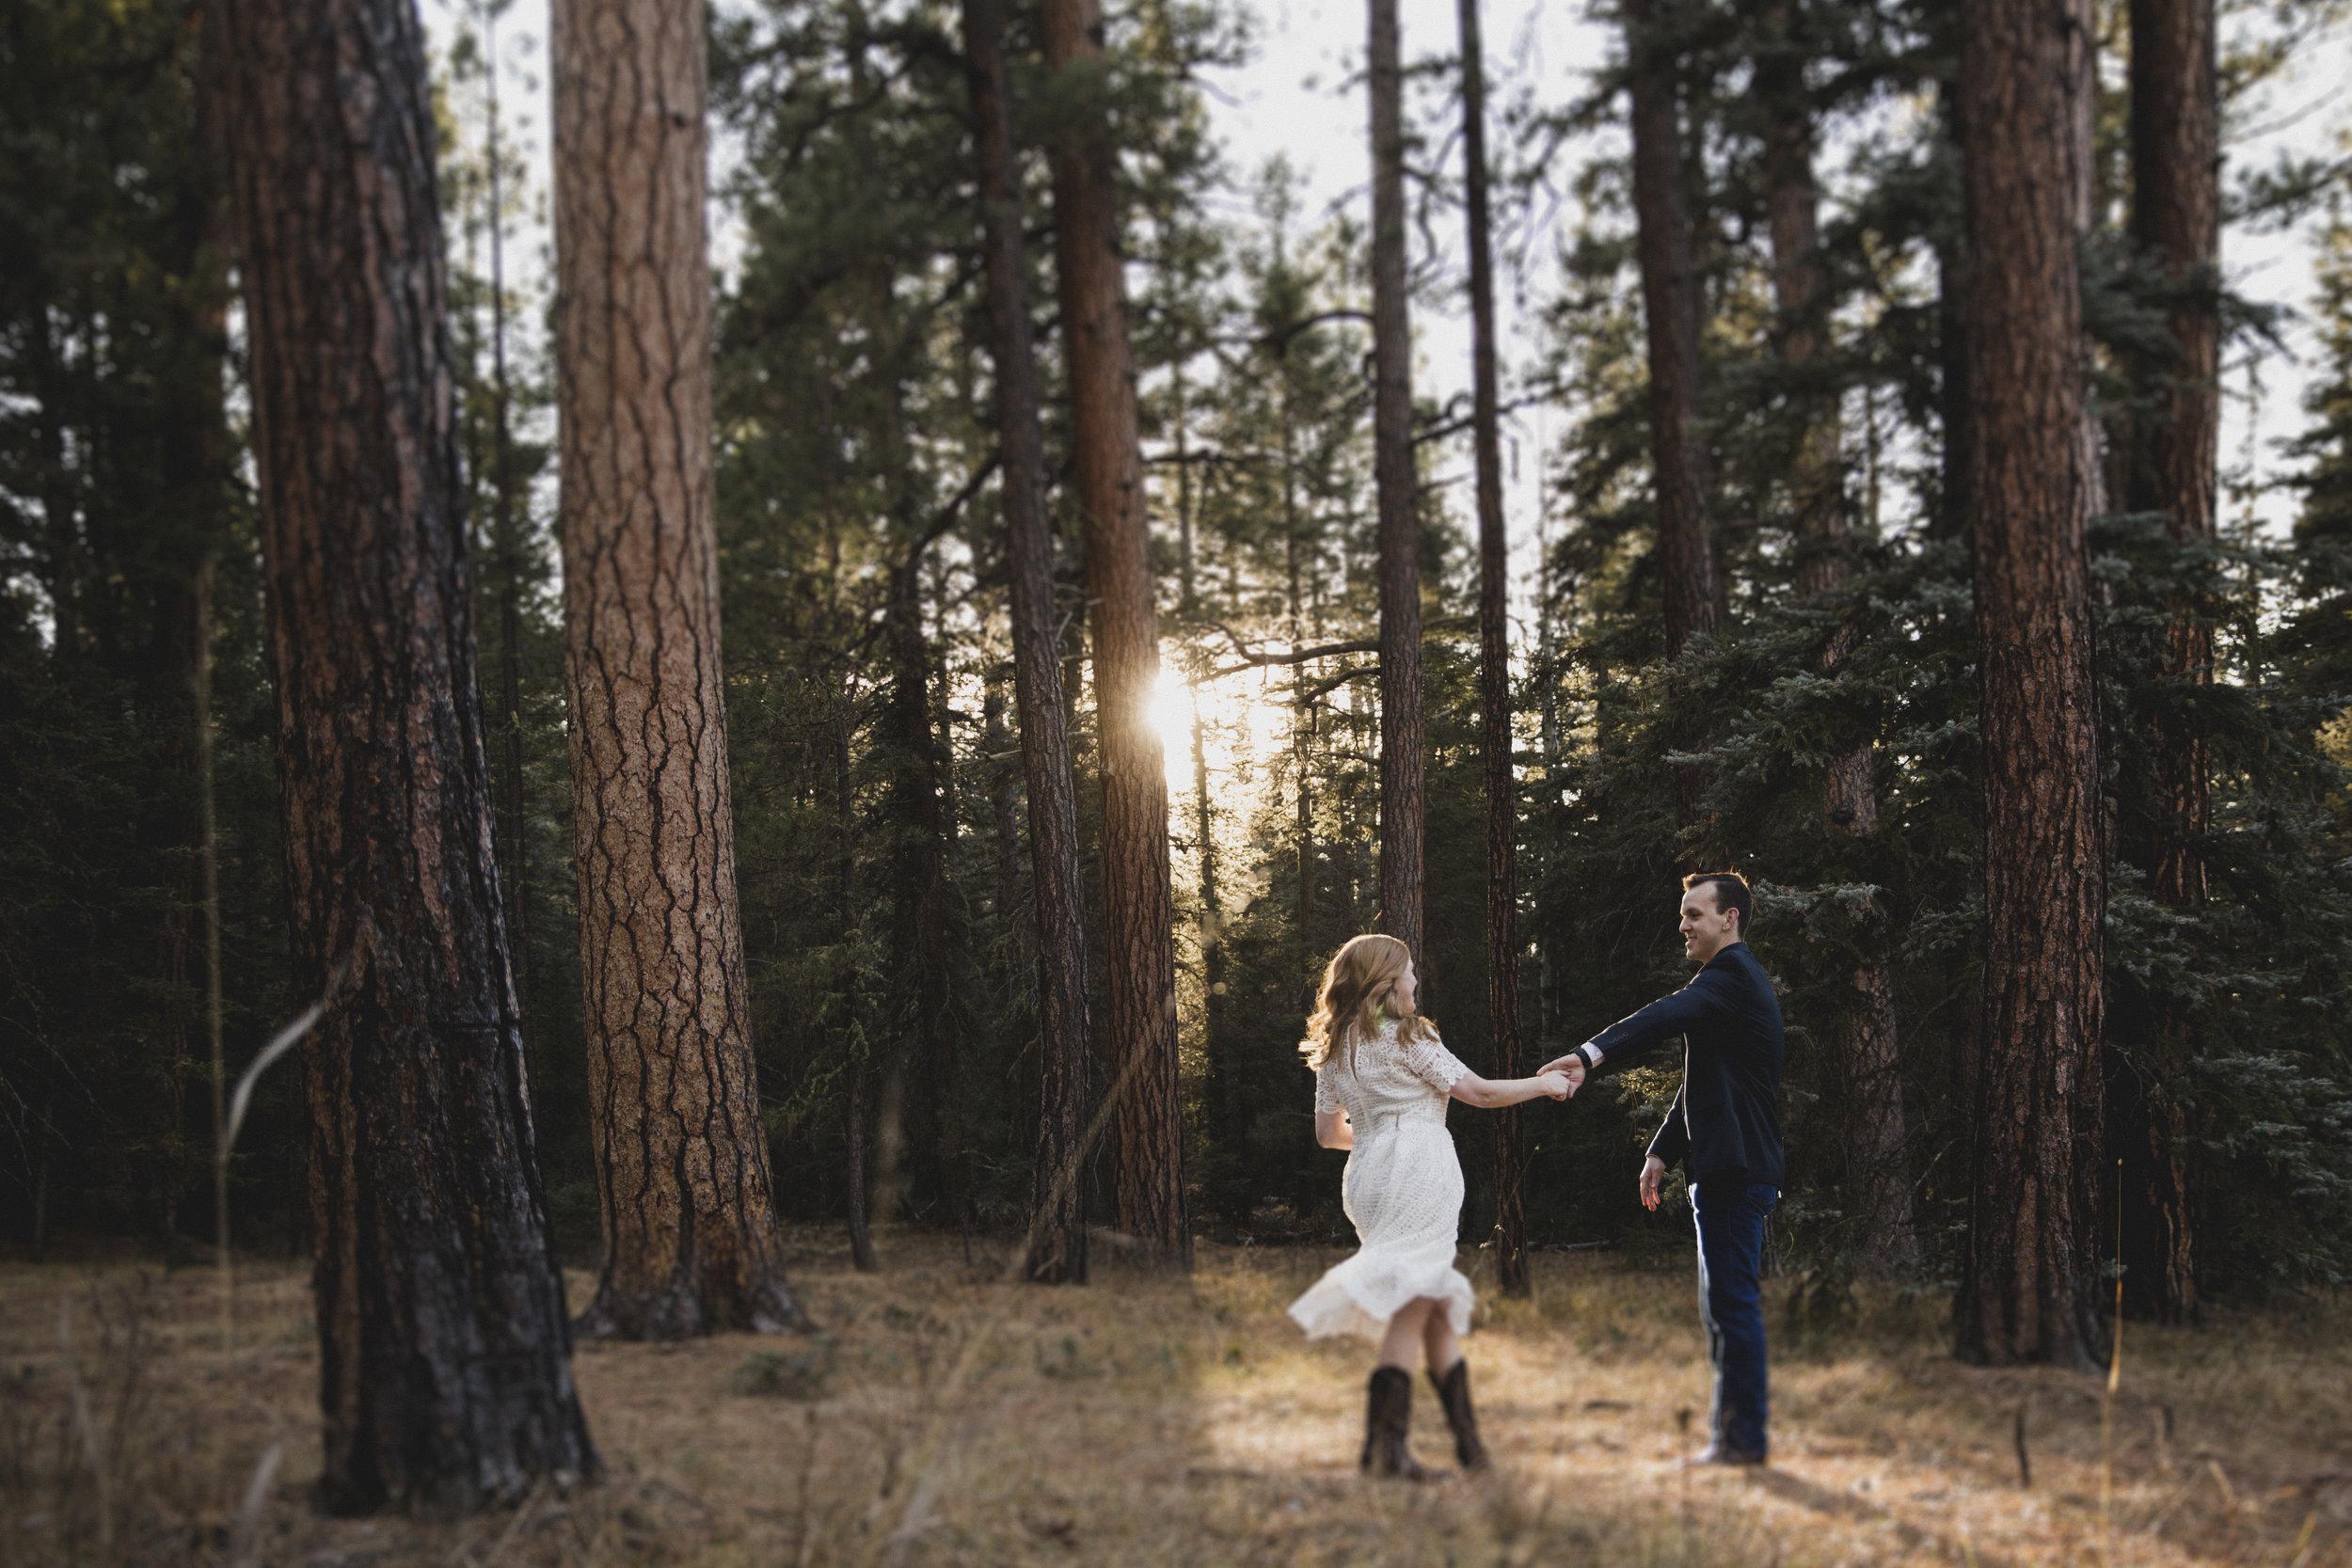 AB-LeahandAshtonphotography-Pagosa-Springs-Telluride-Wedding--8187.jpg